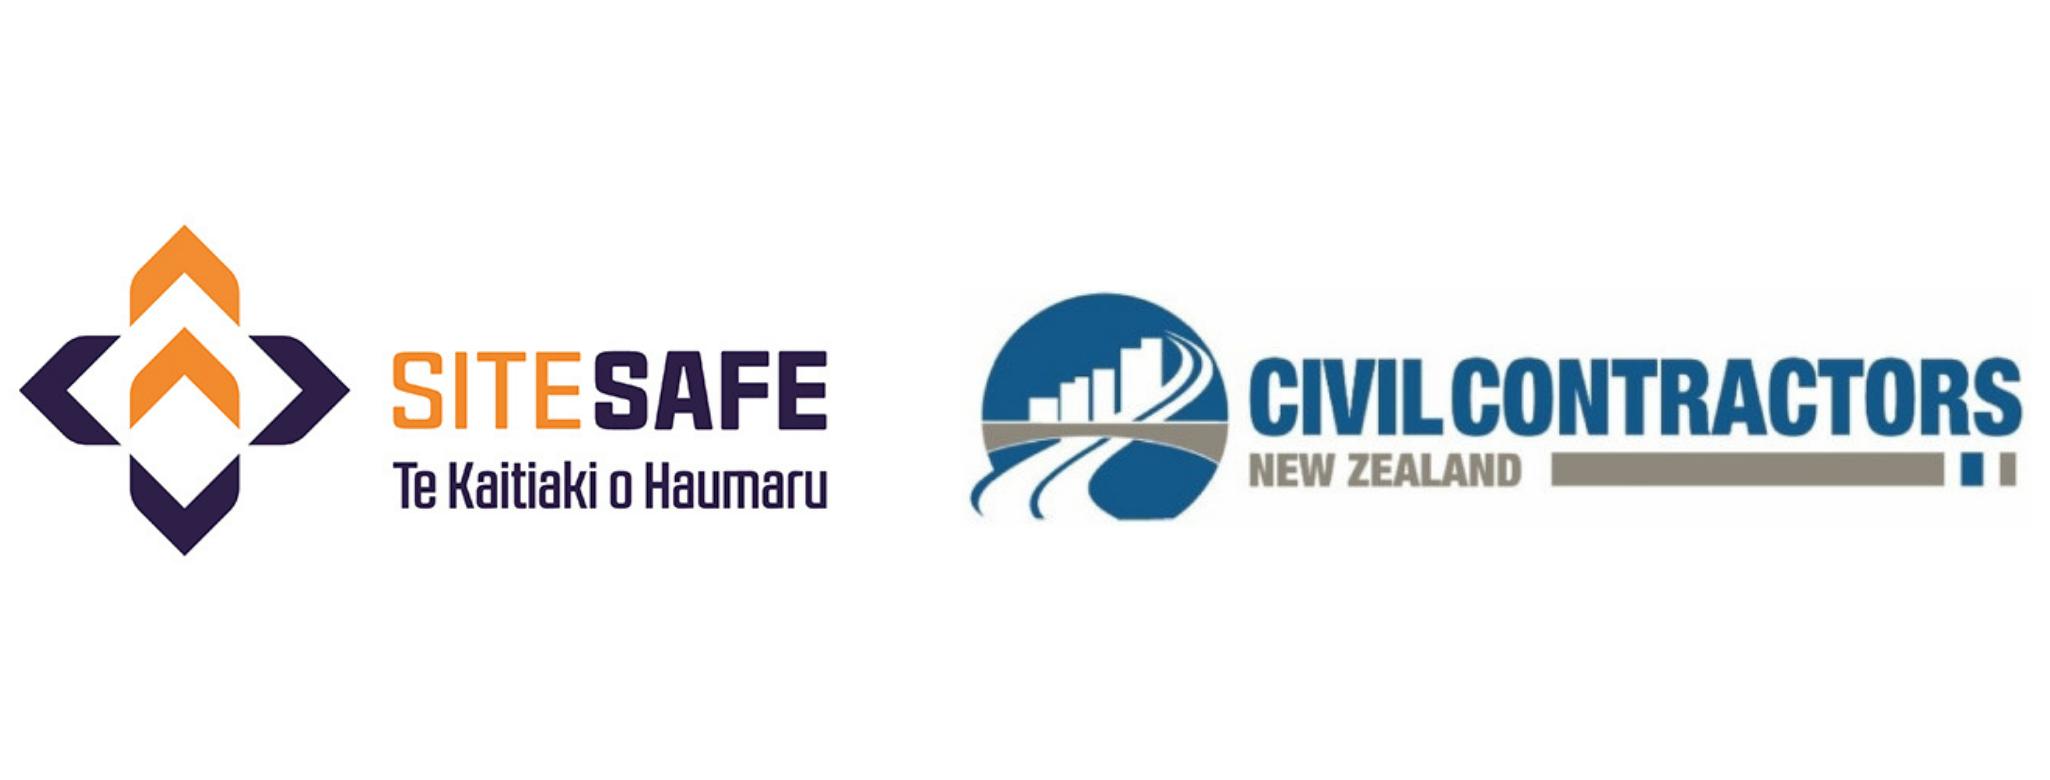 Site Safe and Civil Contractors